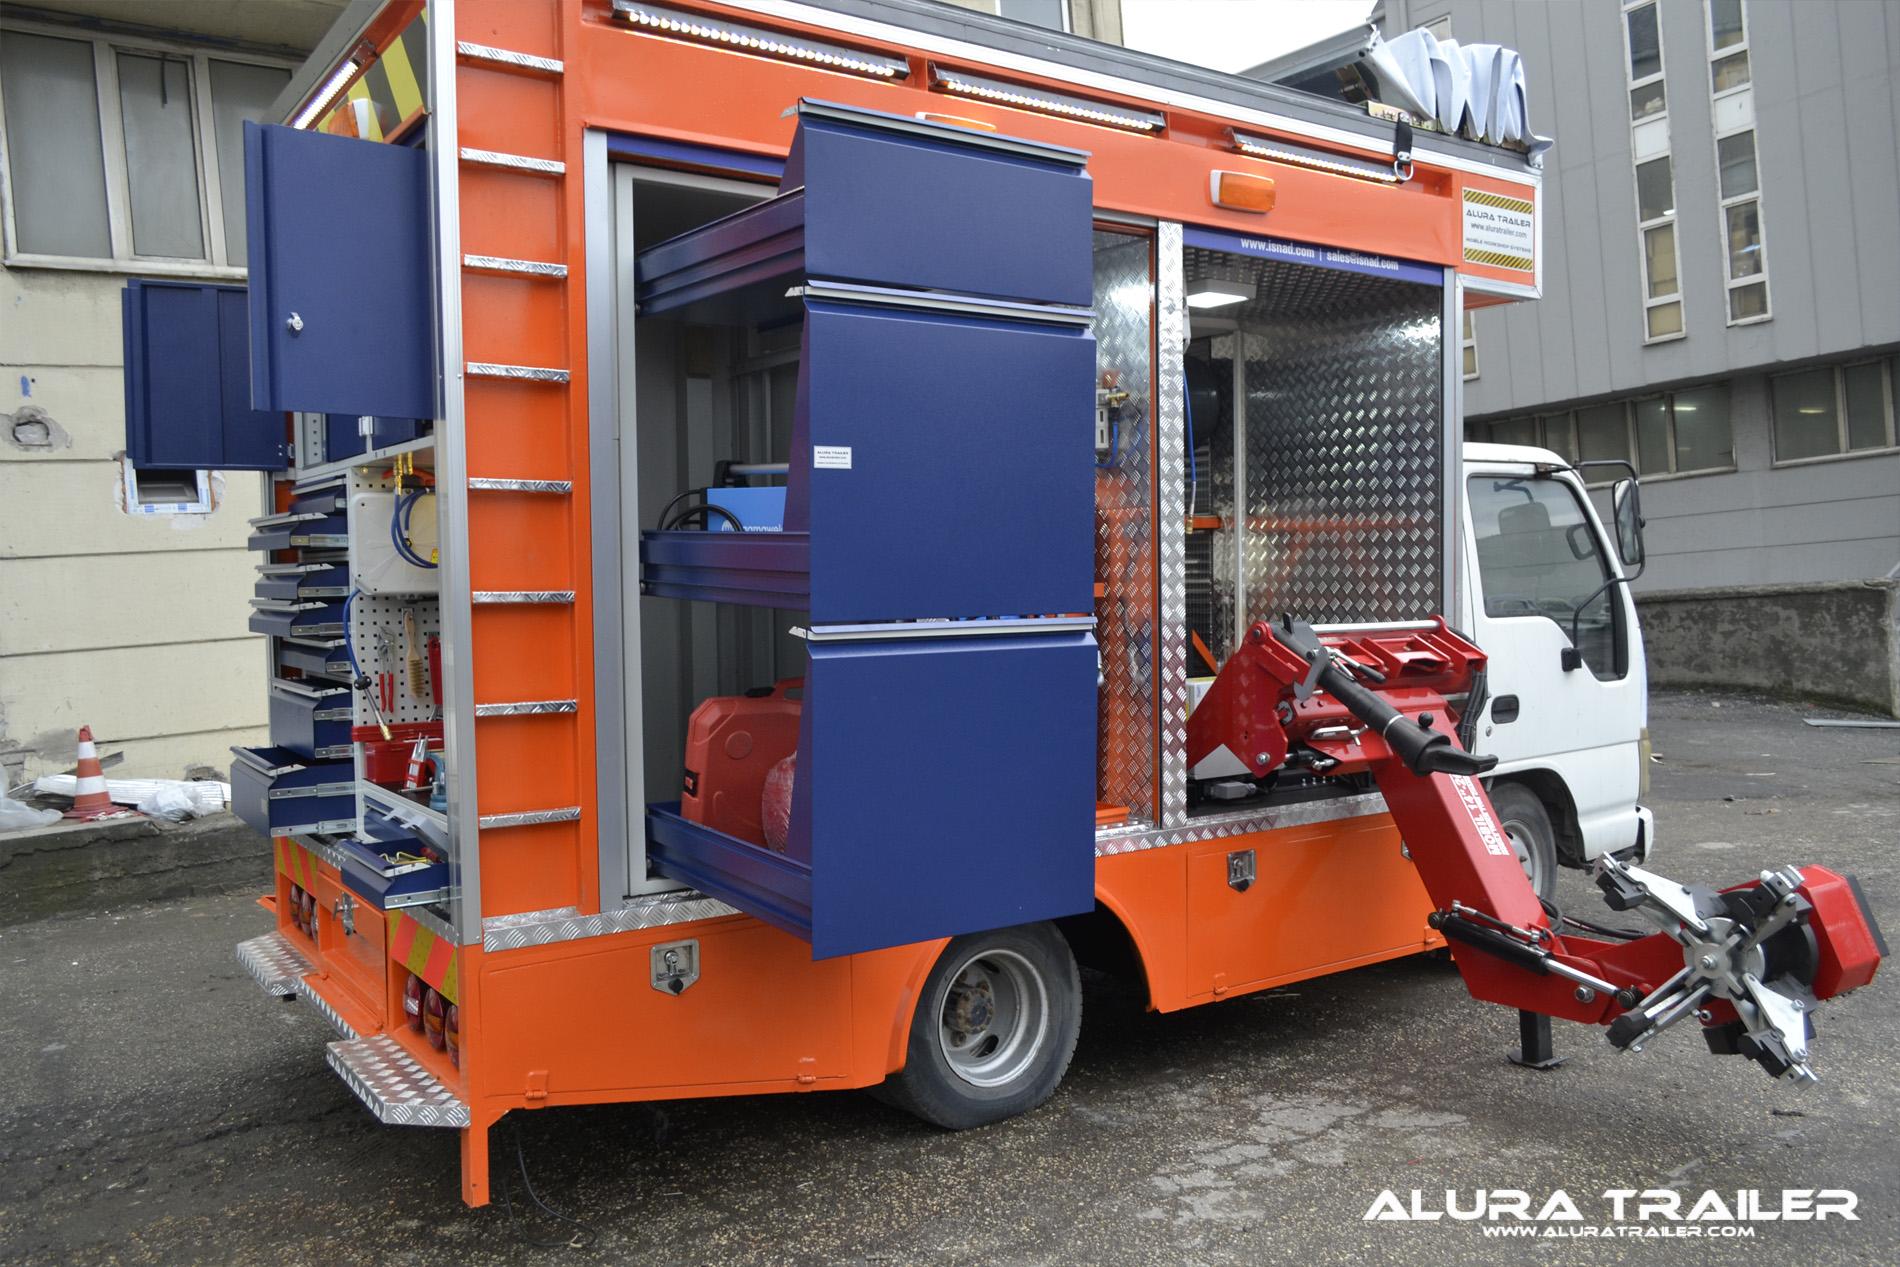 Alura trailer turkey mobile vehicles for Rv workshop